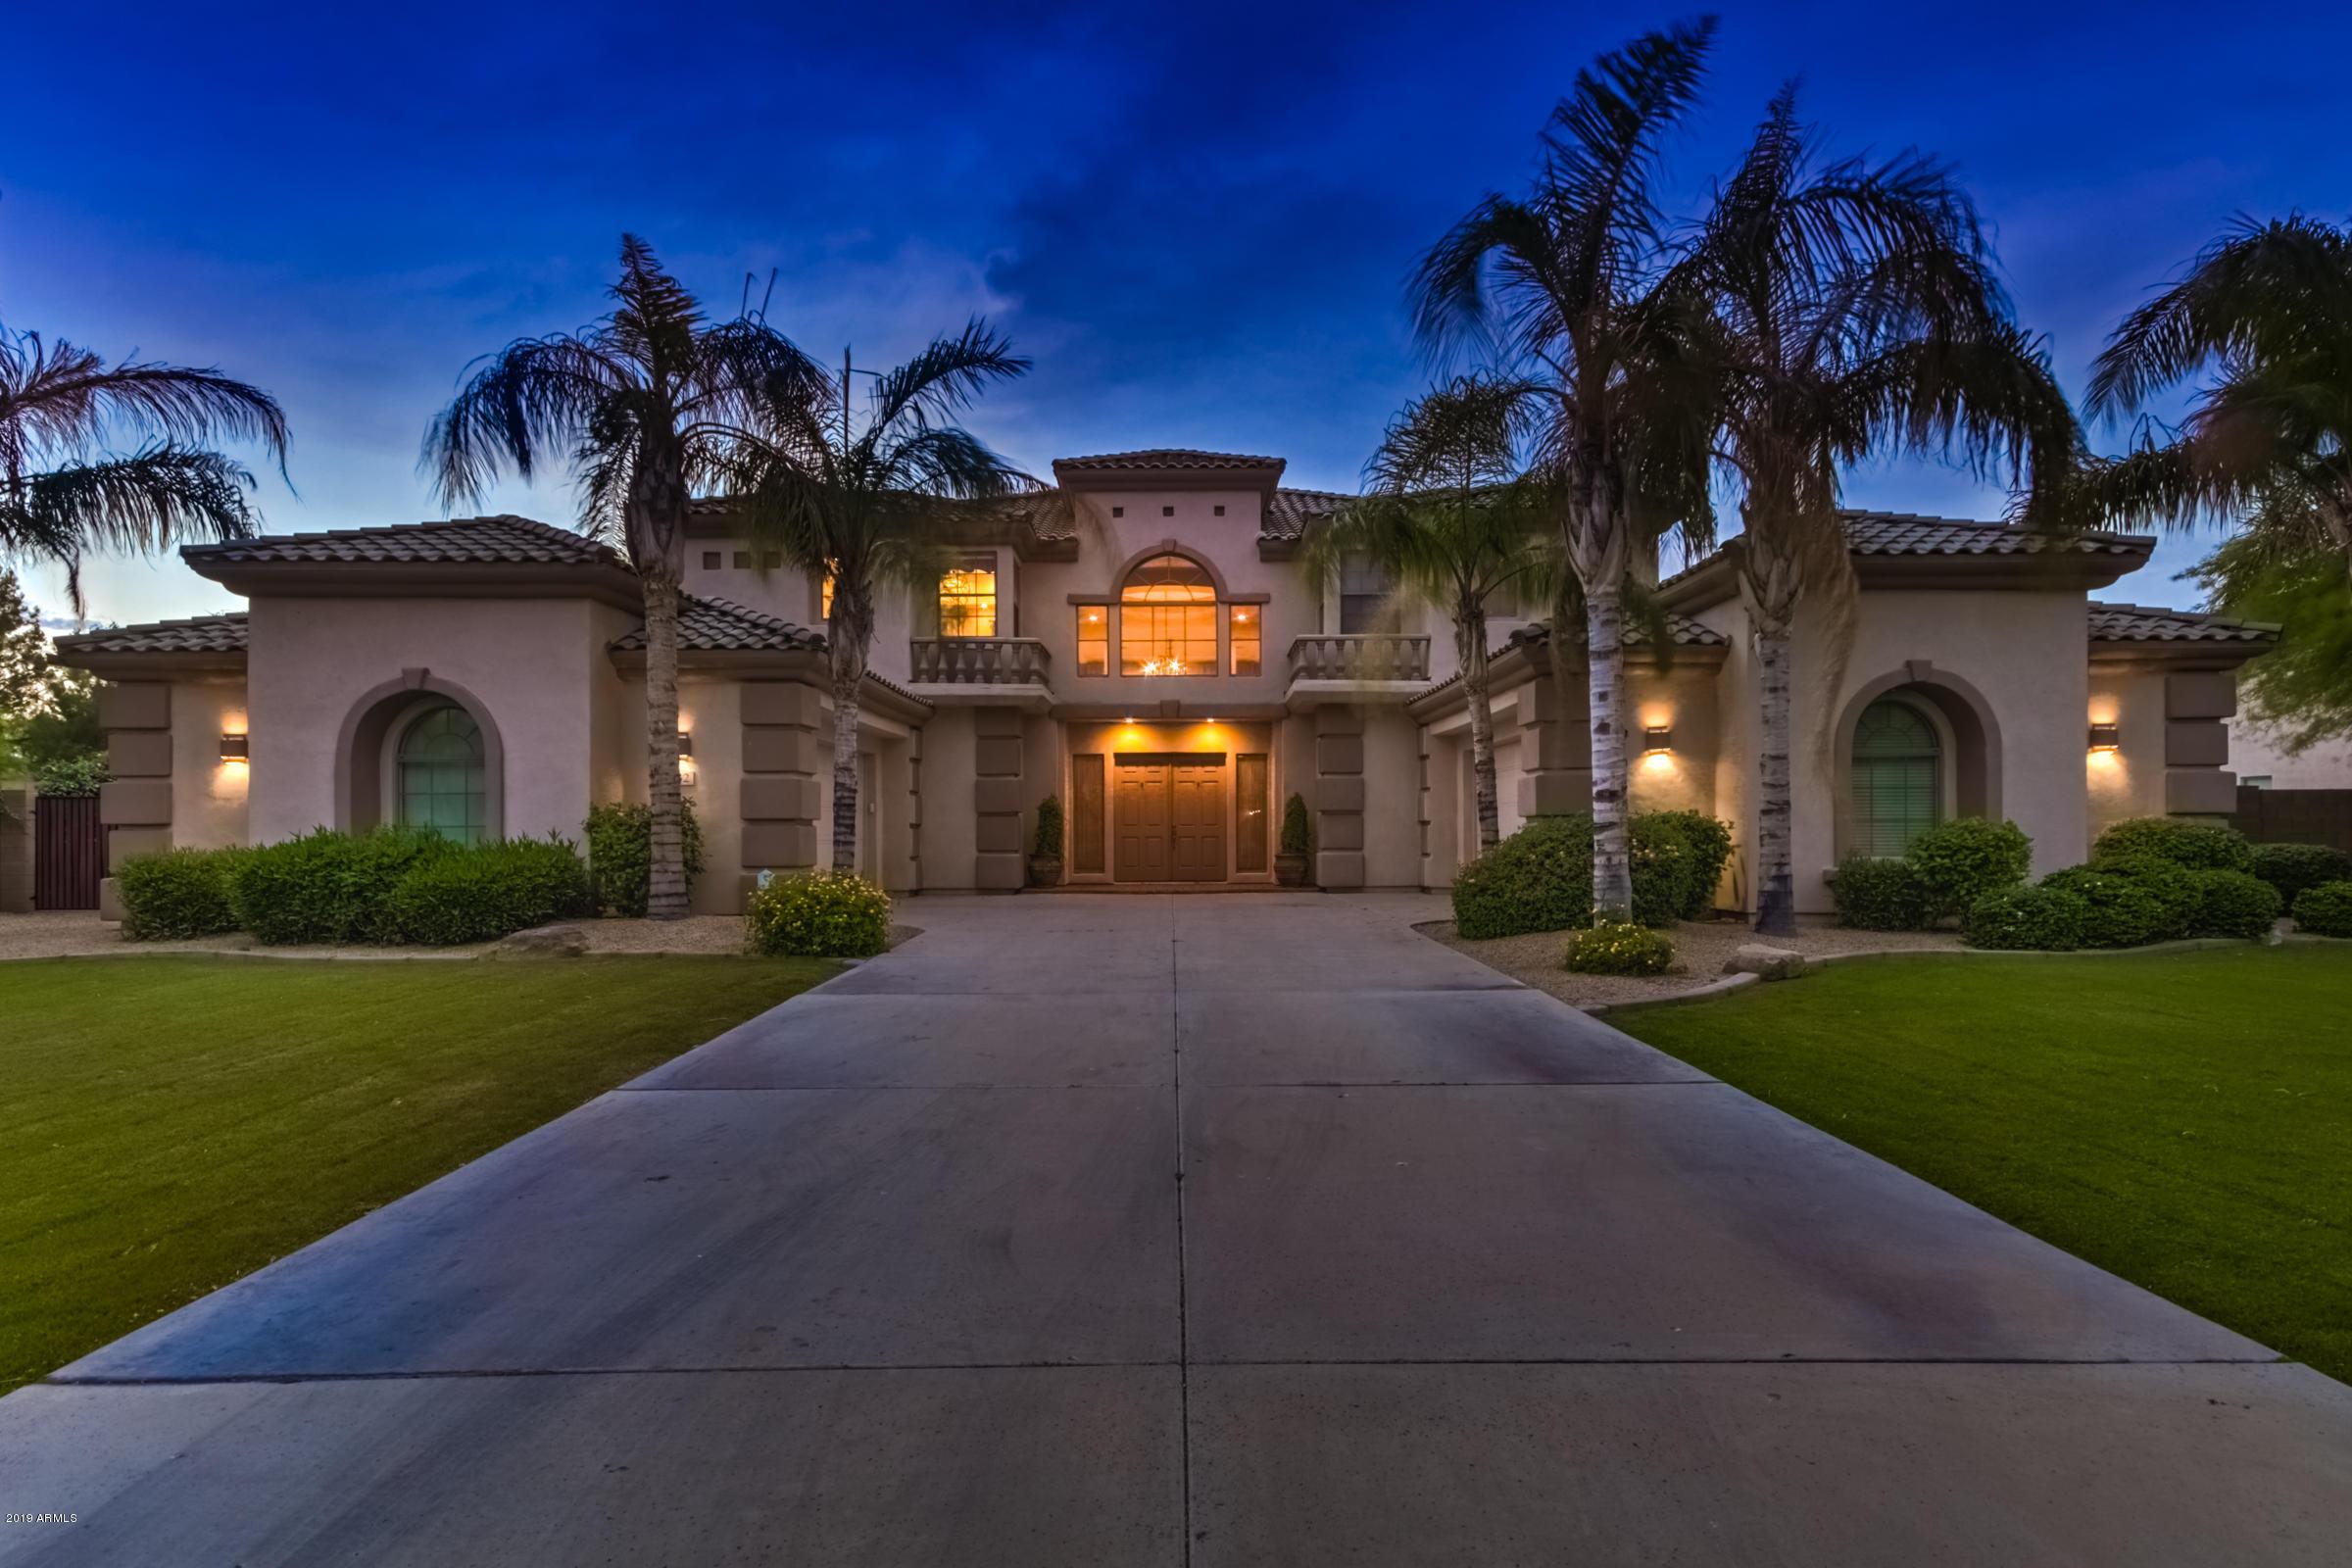 MLS 5848327 2732 S BALBOA Drive, Gilbert, AZ 85295 Gilbert AZ Chaparral Estates